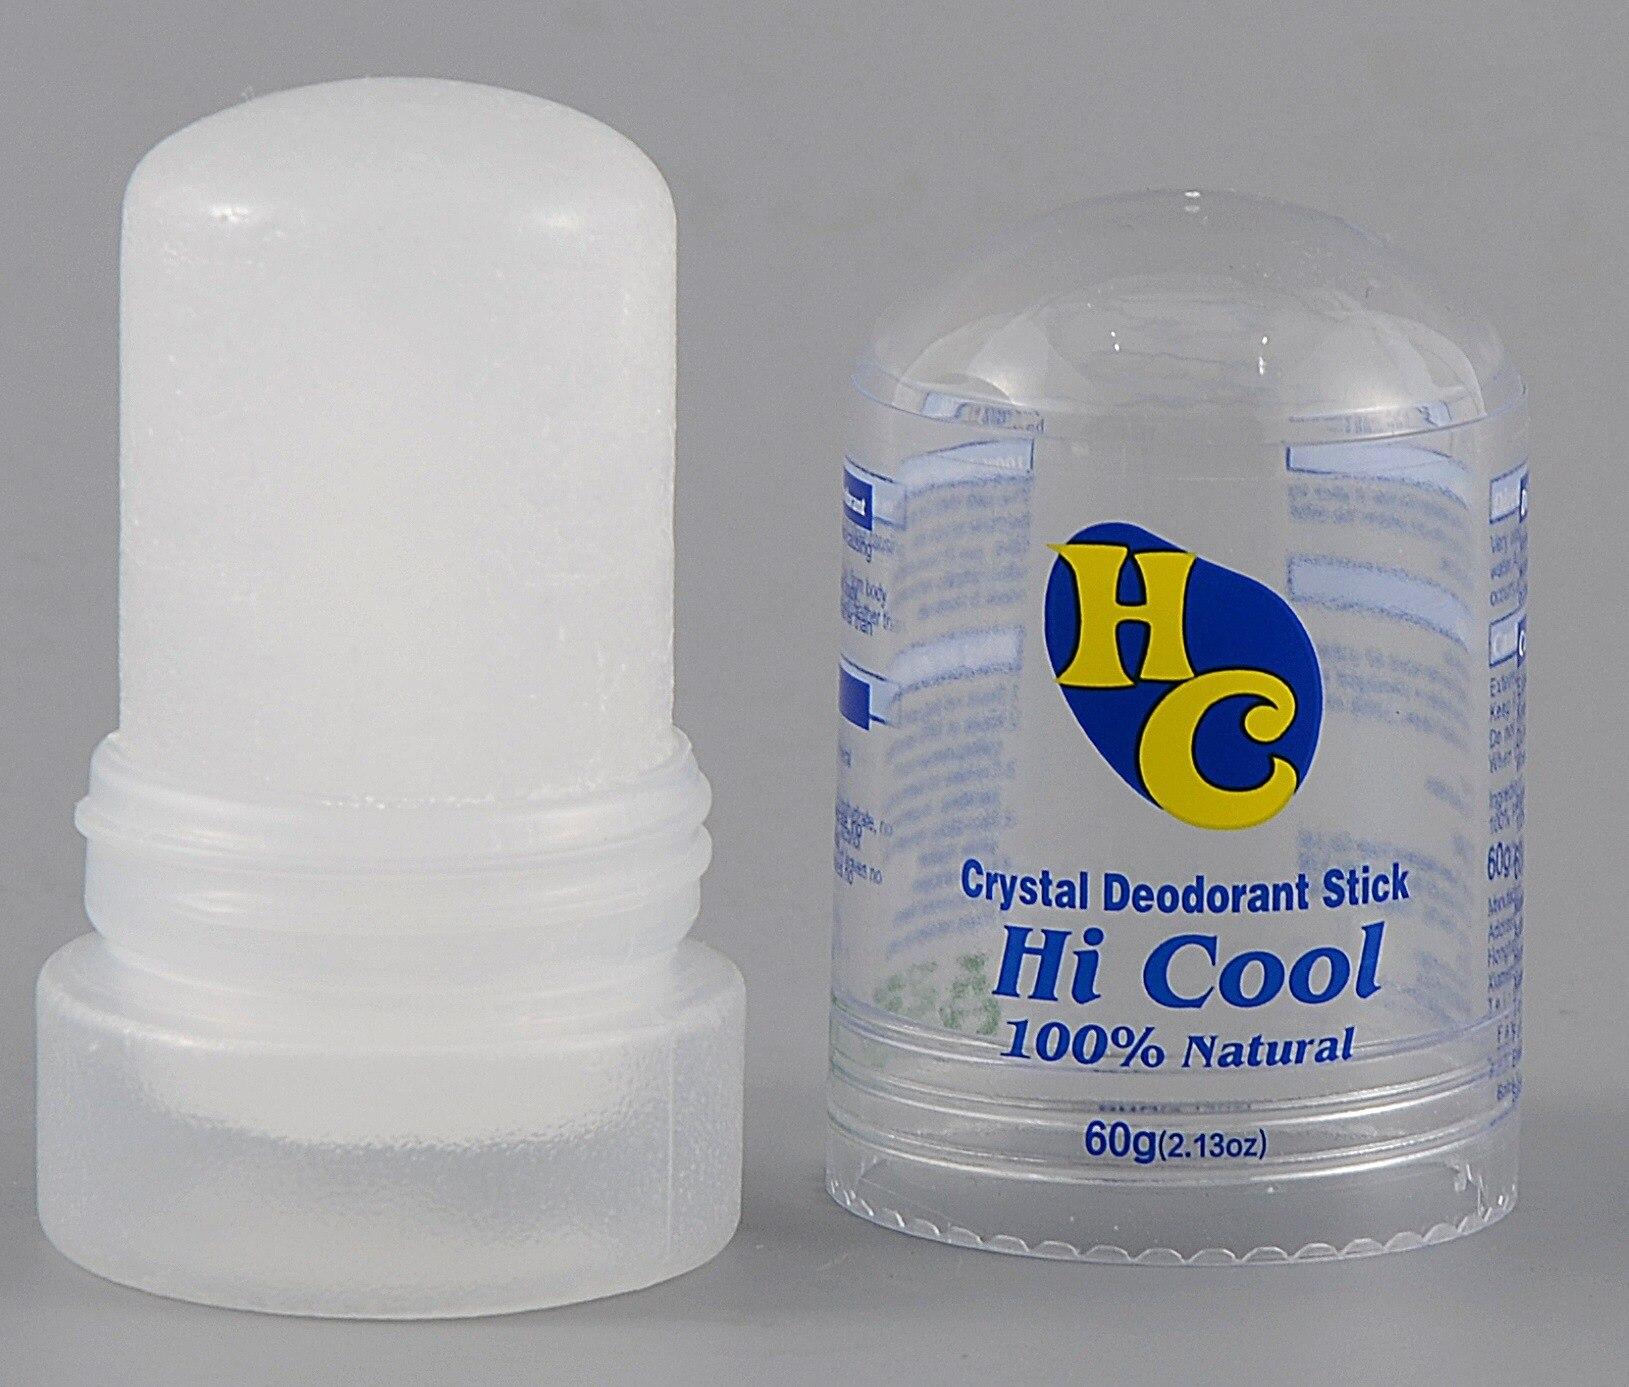 Alum Antiperspirant Deodorant Body Crystal Underarm Antiperspirant Deodorant Stone Body Care Deodorant